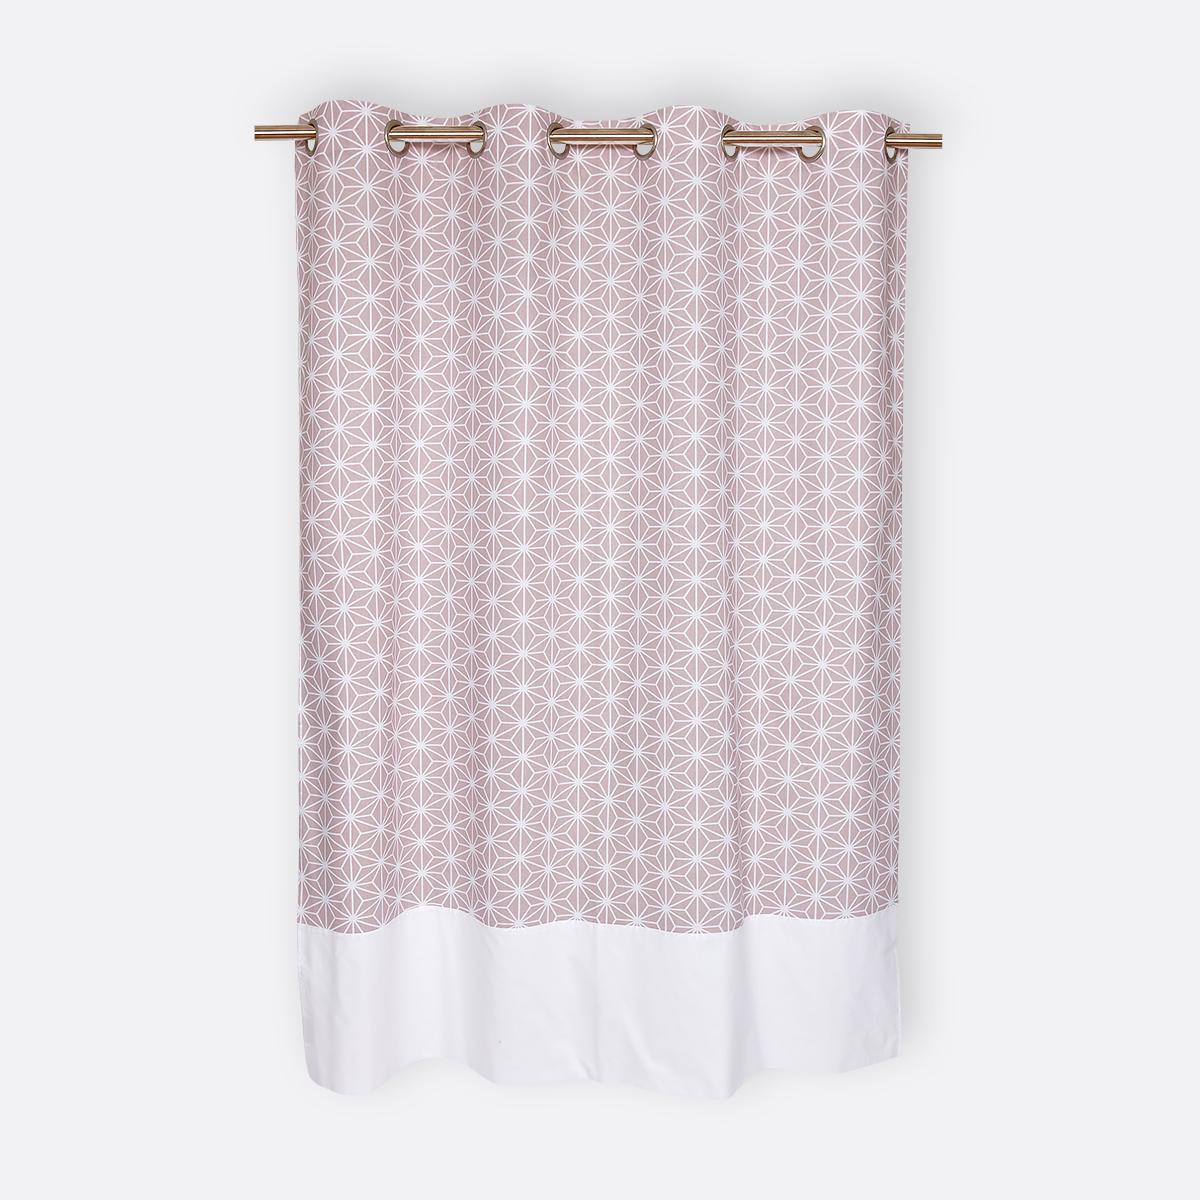 kraftkids gardinen wei e diamante auf cameo rosa l nge 170 cm. Black Bedroom Furniture Sets. Home Design Ideas